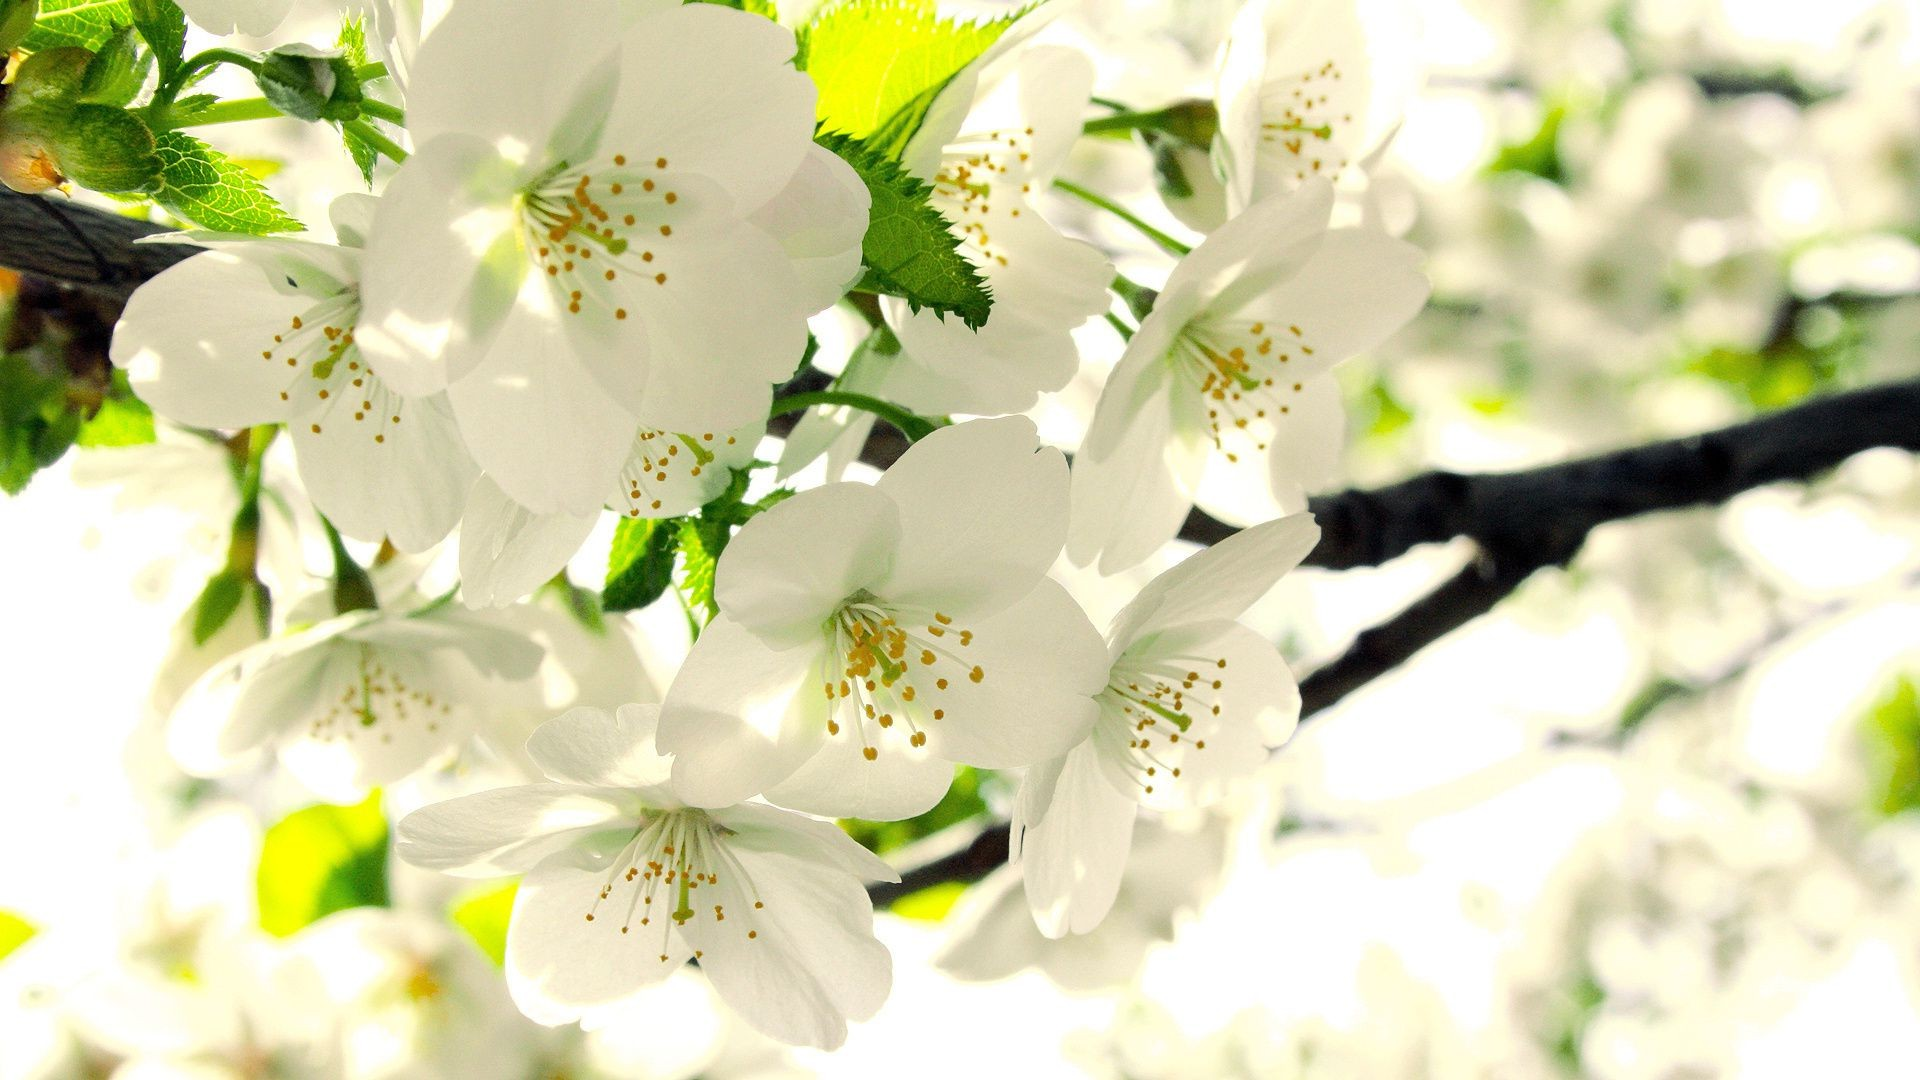 дерево, вишня, цветы, белые онлайн